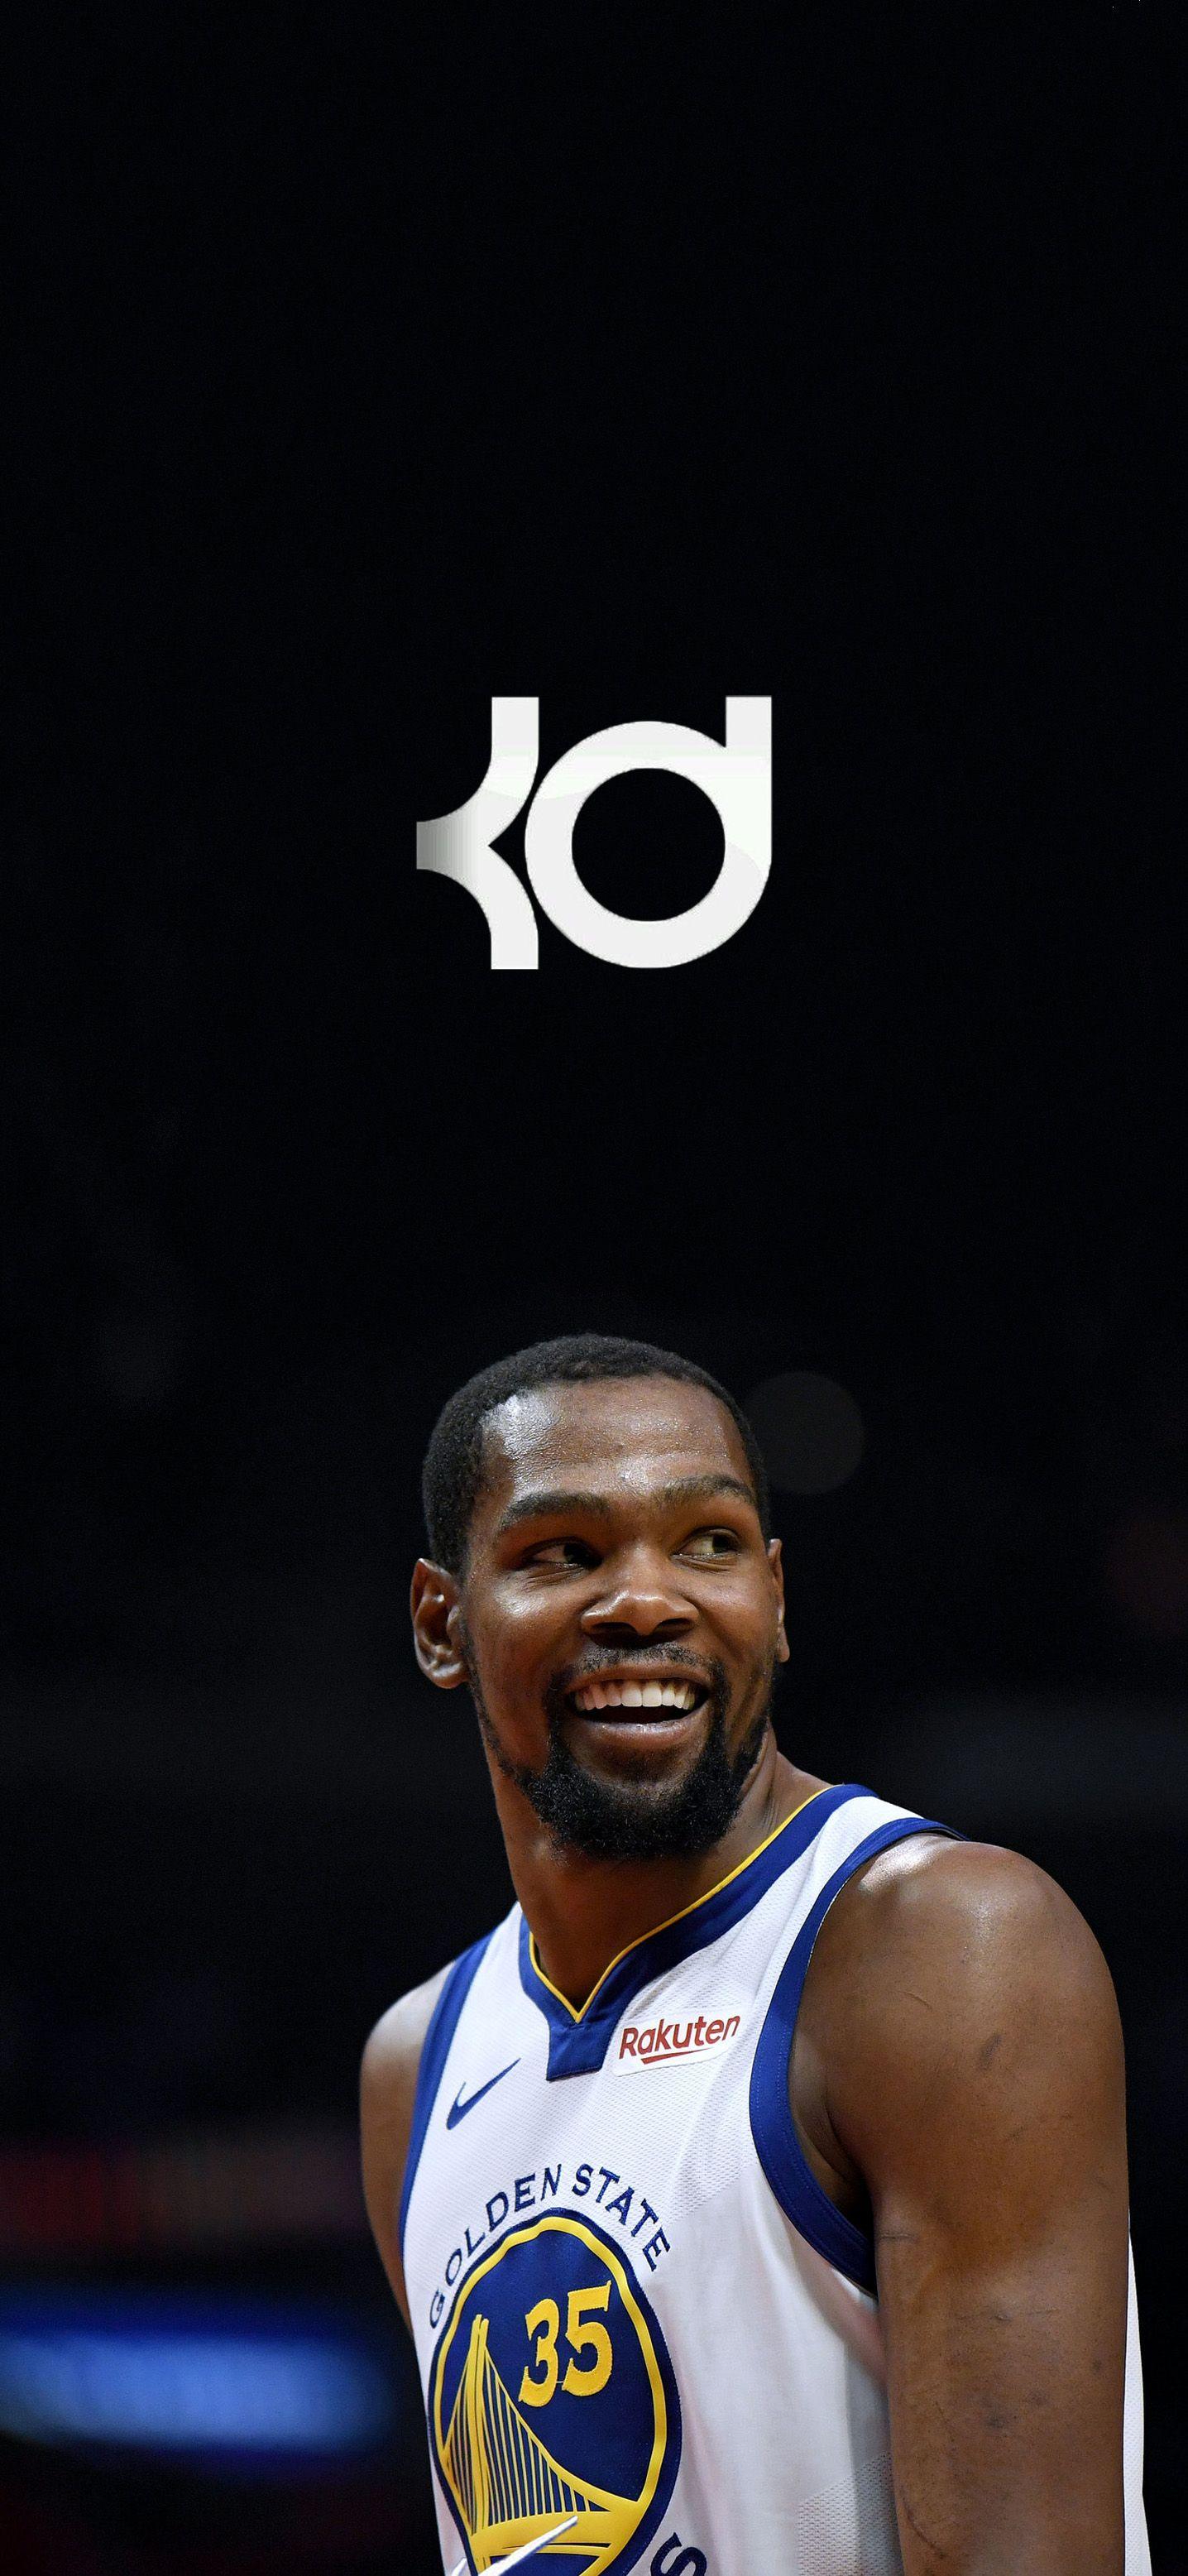 Kevin Durant Wallpaper Kevin Durant Wallpapers Kevin Durant Kobe Bryant Wallpaper